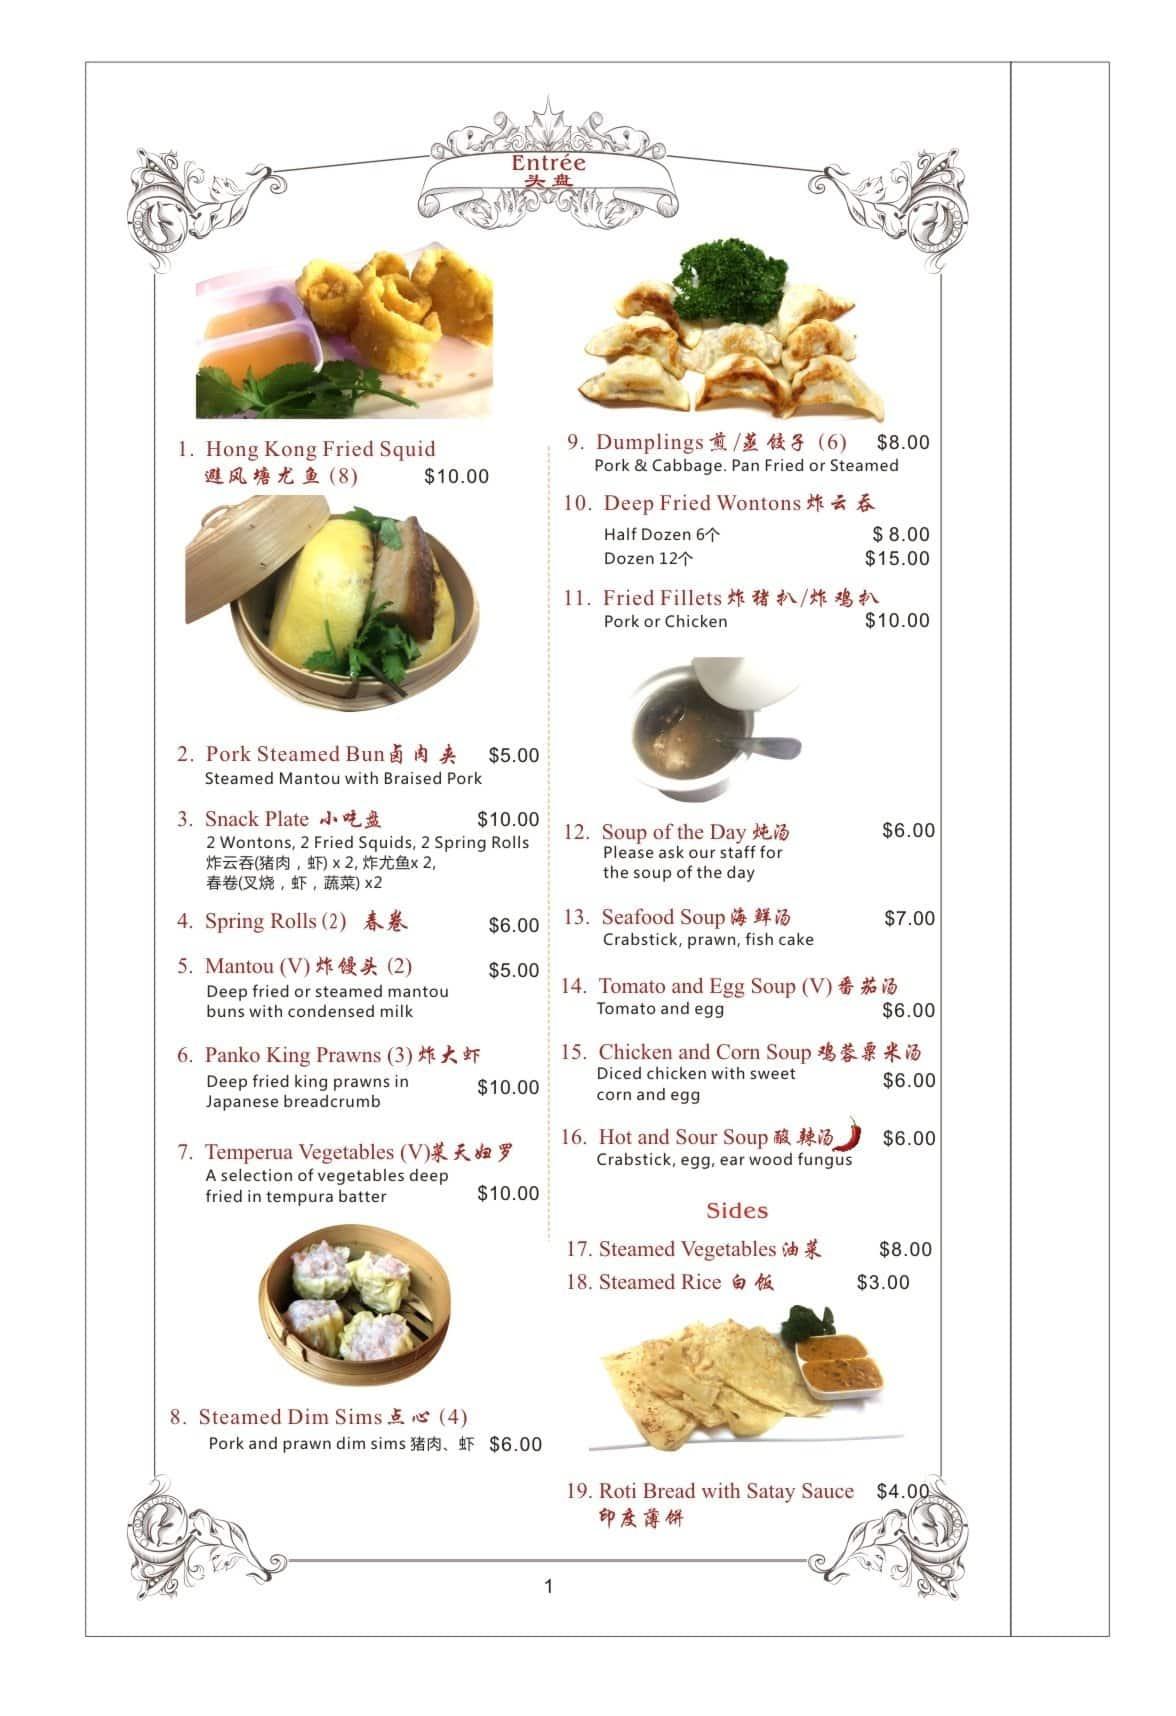 Magic Kitchen Menu, Menu for Magic Kitchen, Te Aro, Wellington City ...